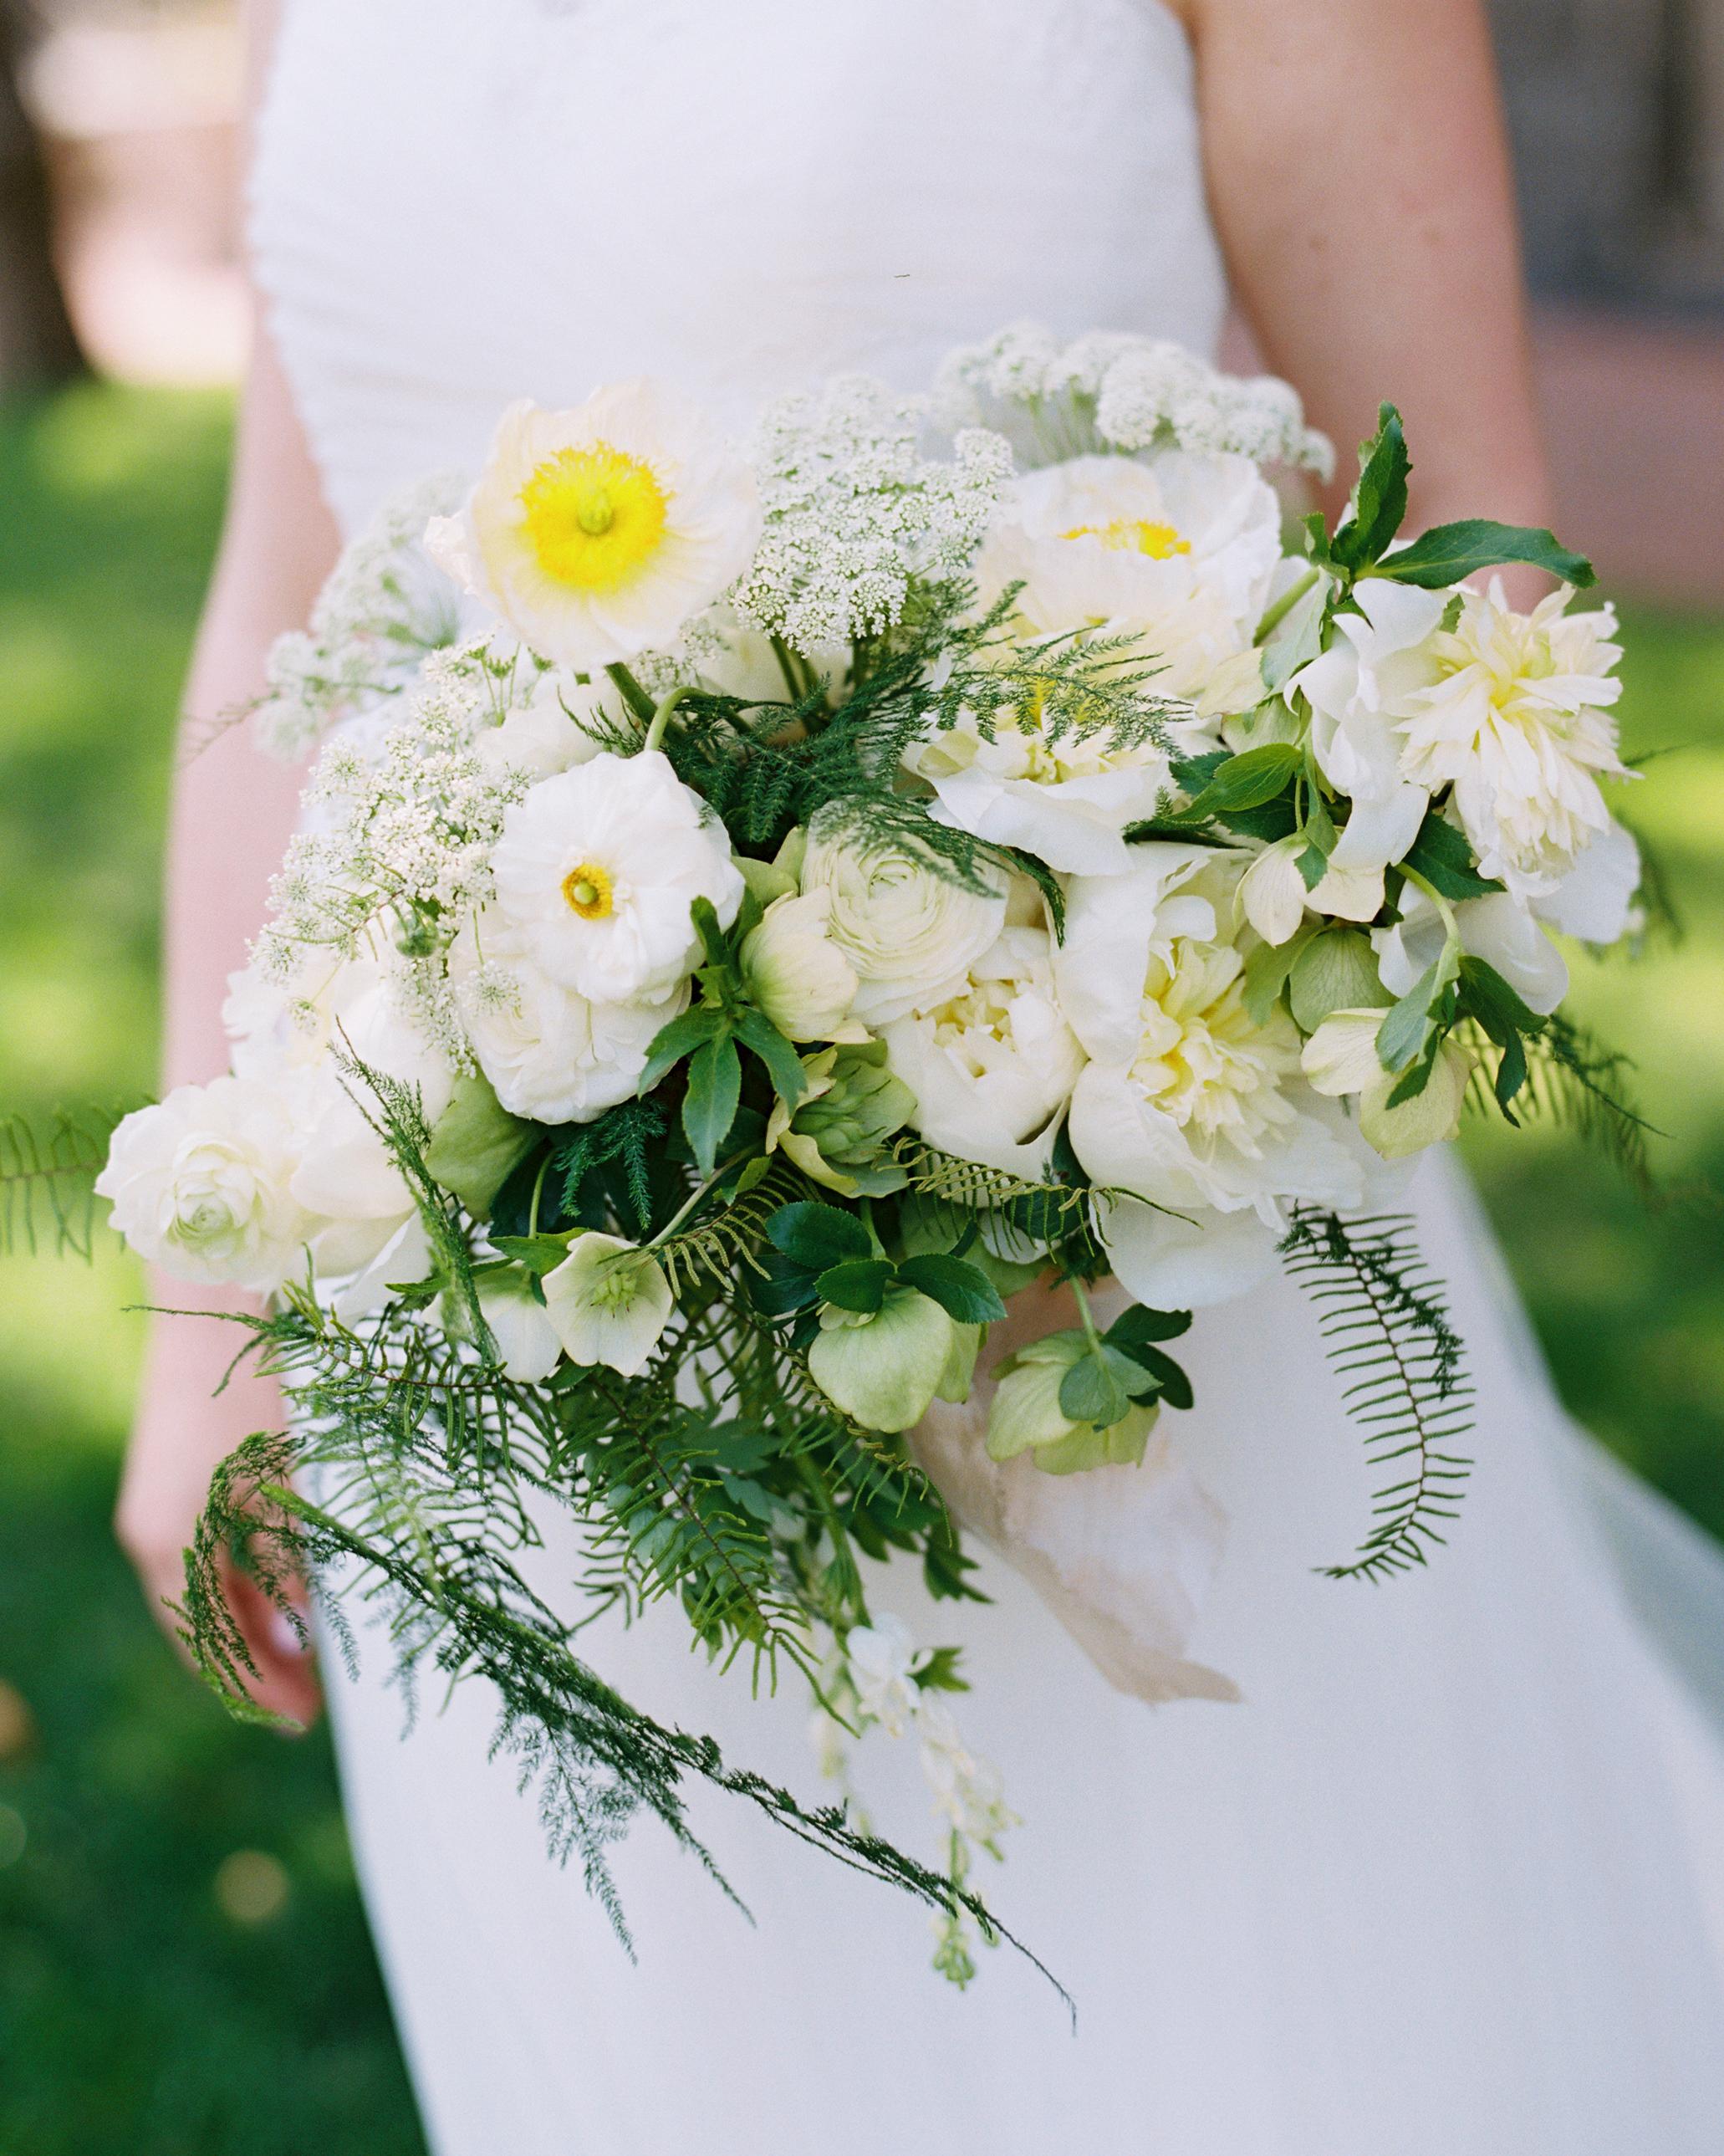 shannon-ryan-wedding-bouquet-179-s111853-0415.jpg